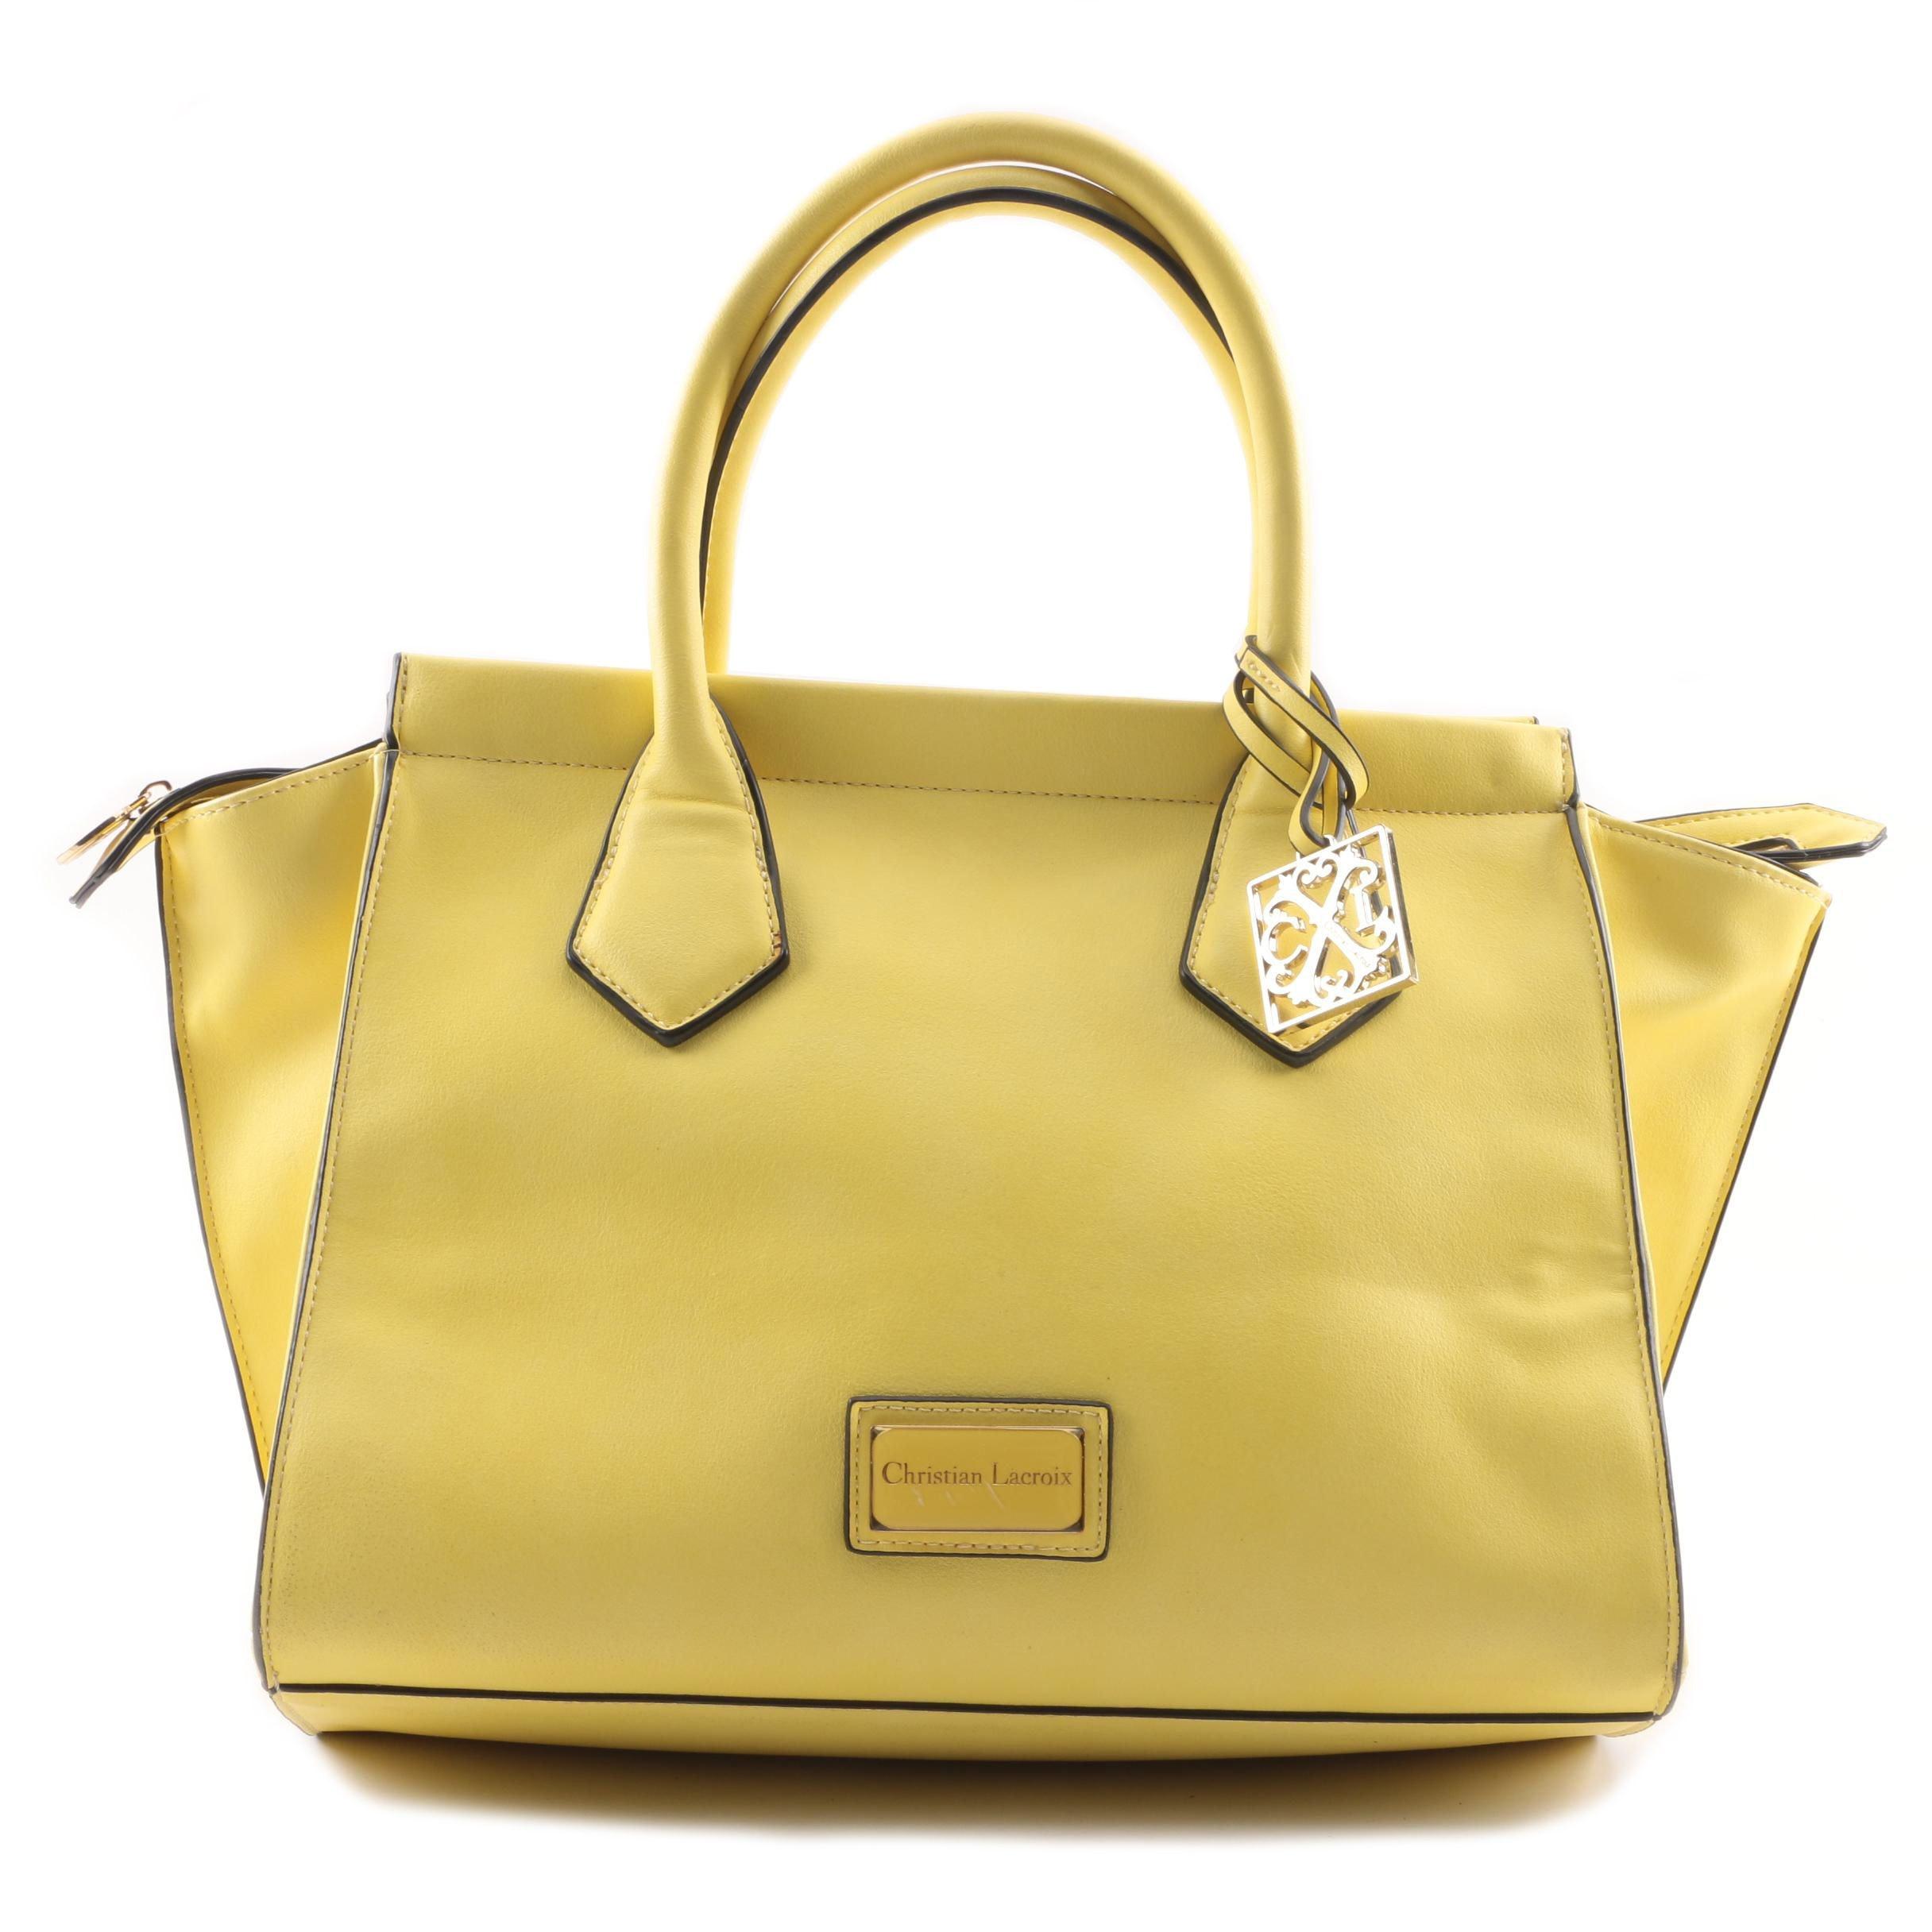 Christian Lacroix Yellow Faux Leather Trapeze Bag